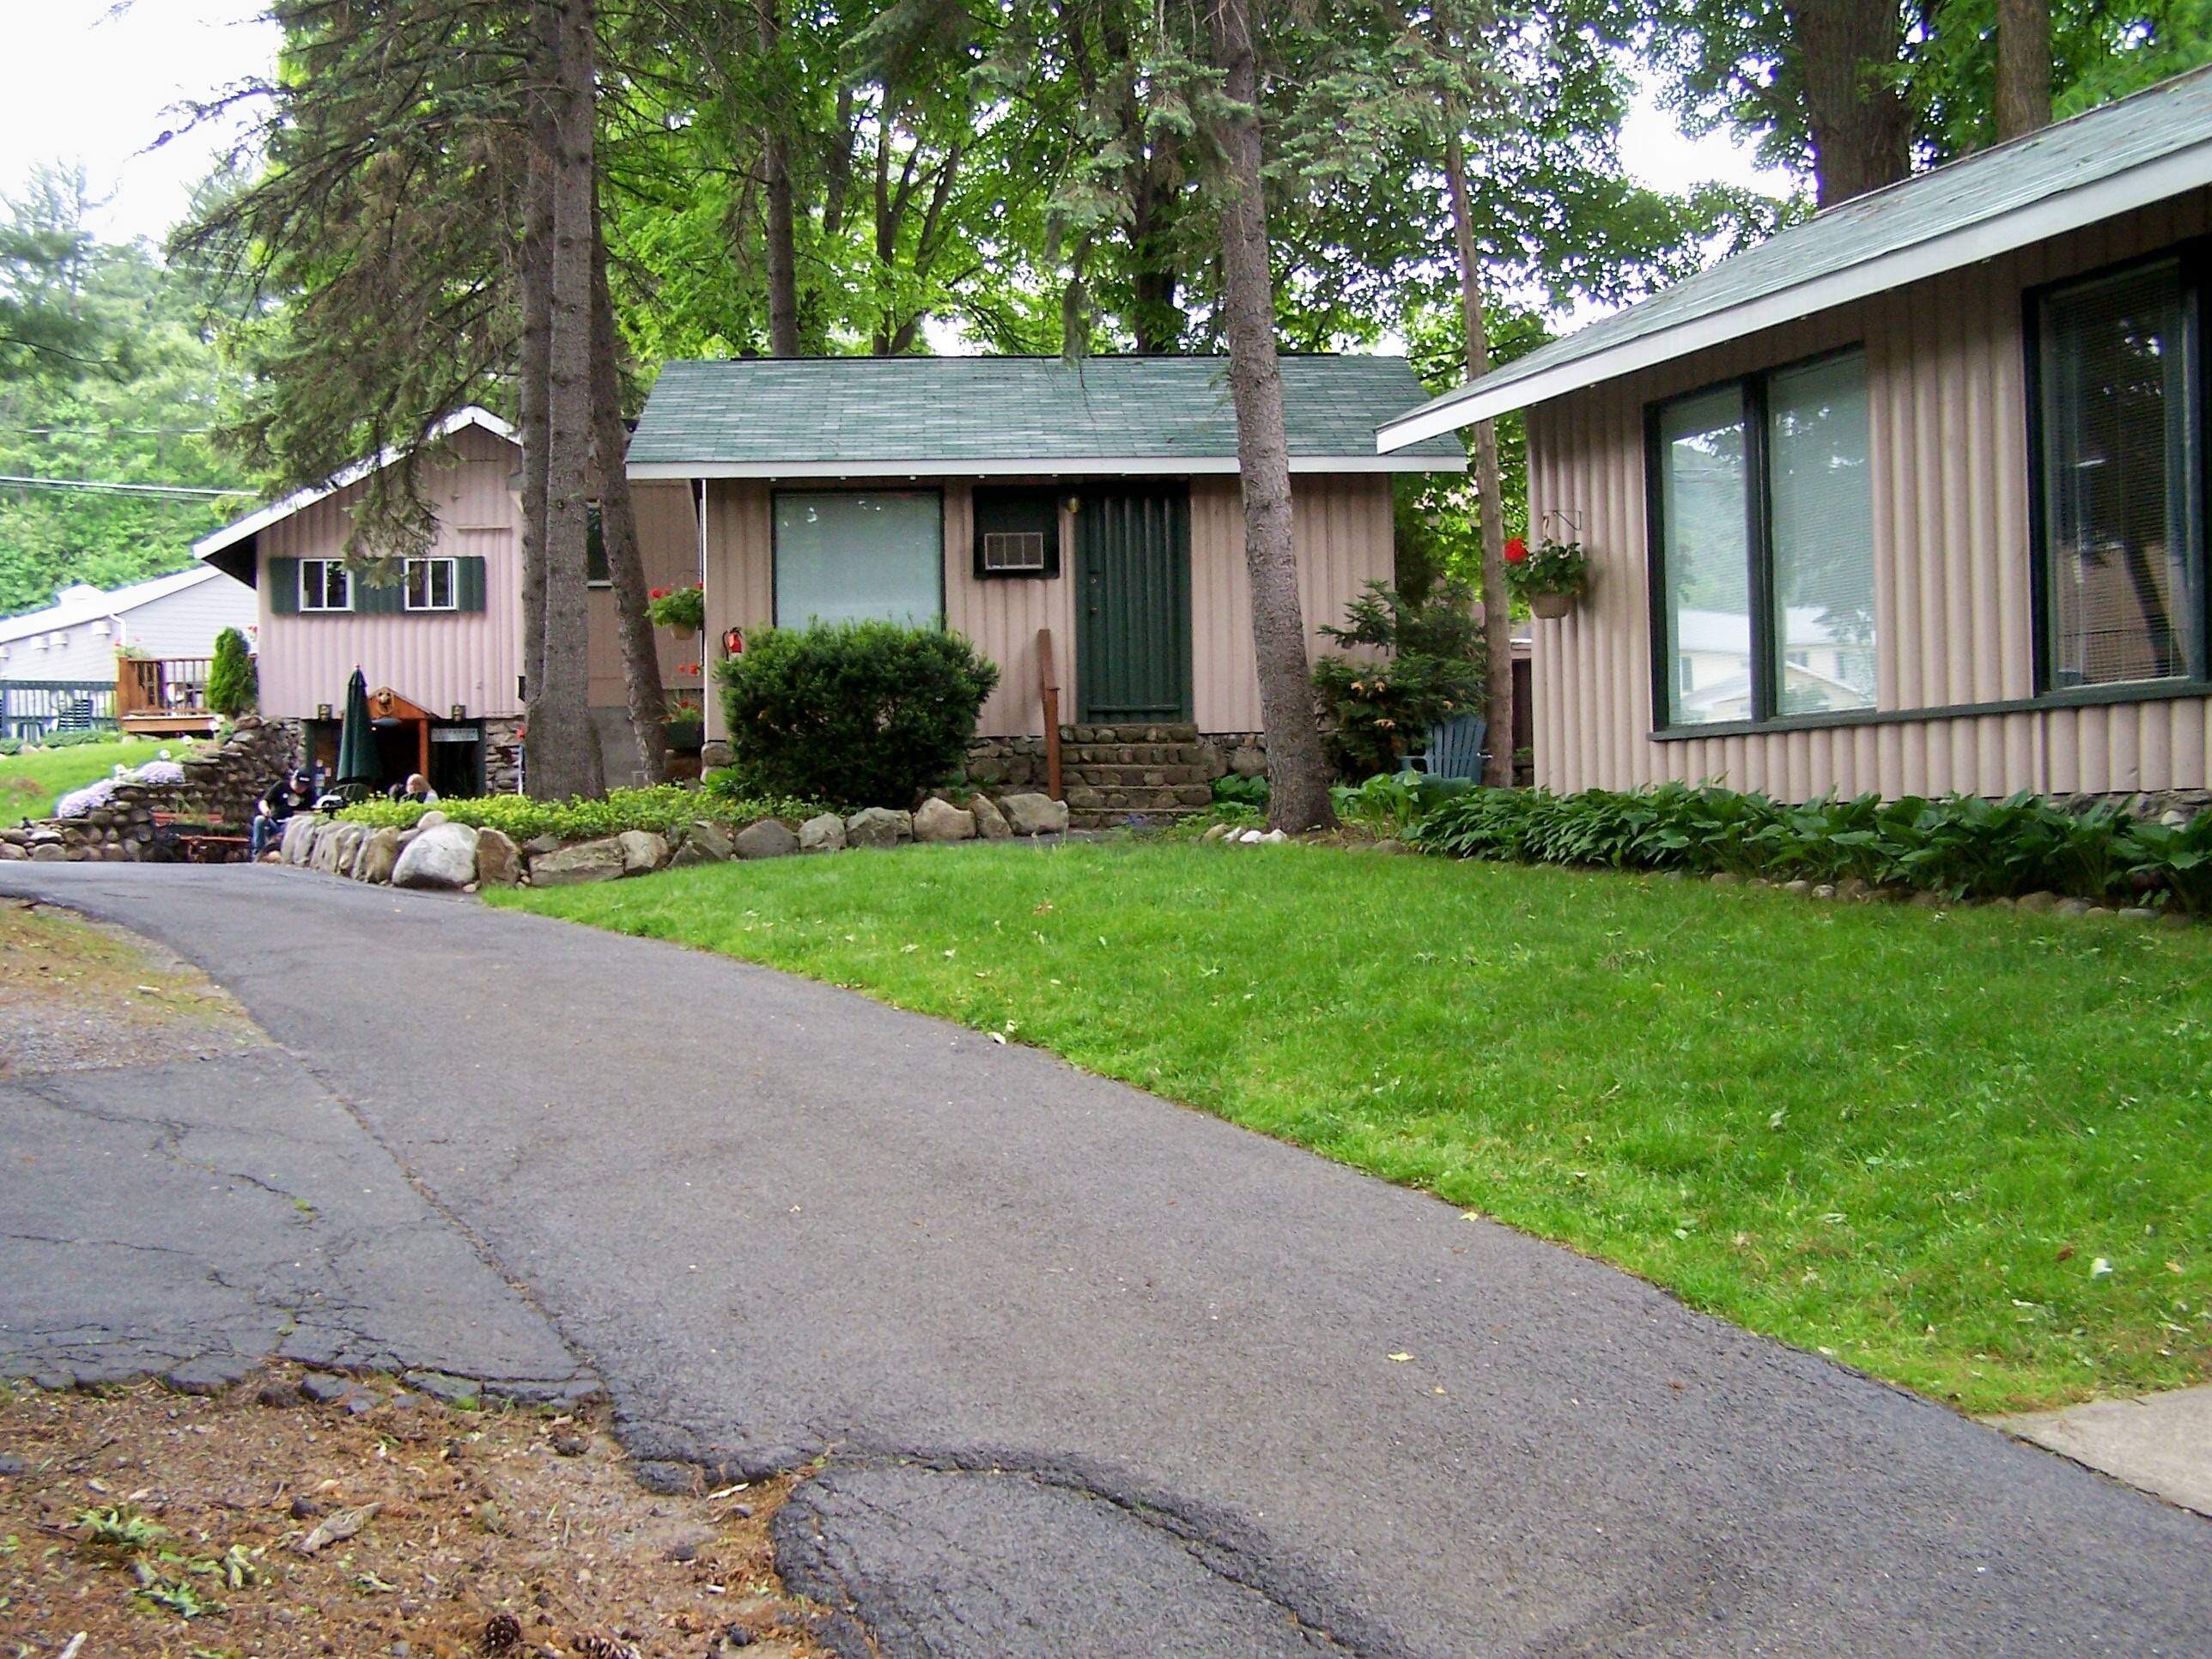 The Balsam Motel & Cottages